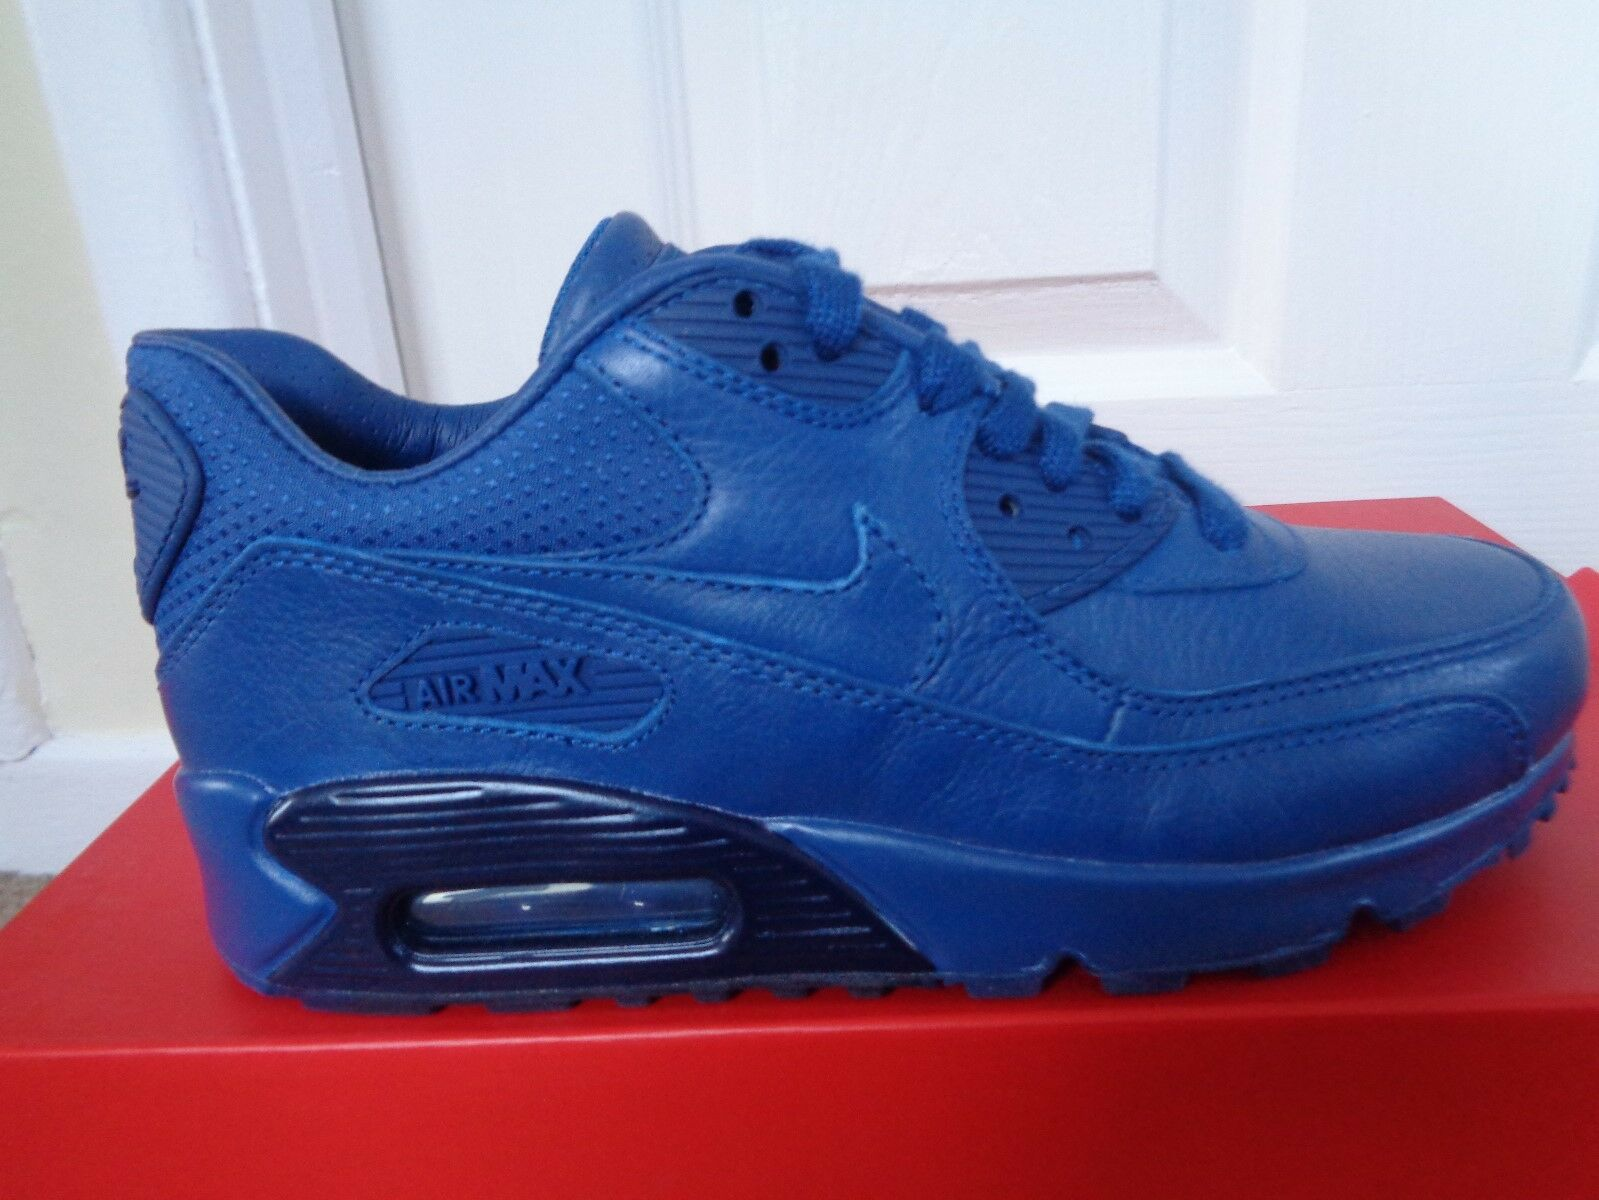 Nike Air Max 90 Zapatos Entrenadores Pinnacle 829612 400 nos 5.5 Nuevo + Caja